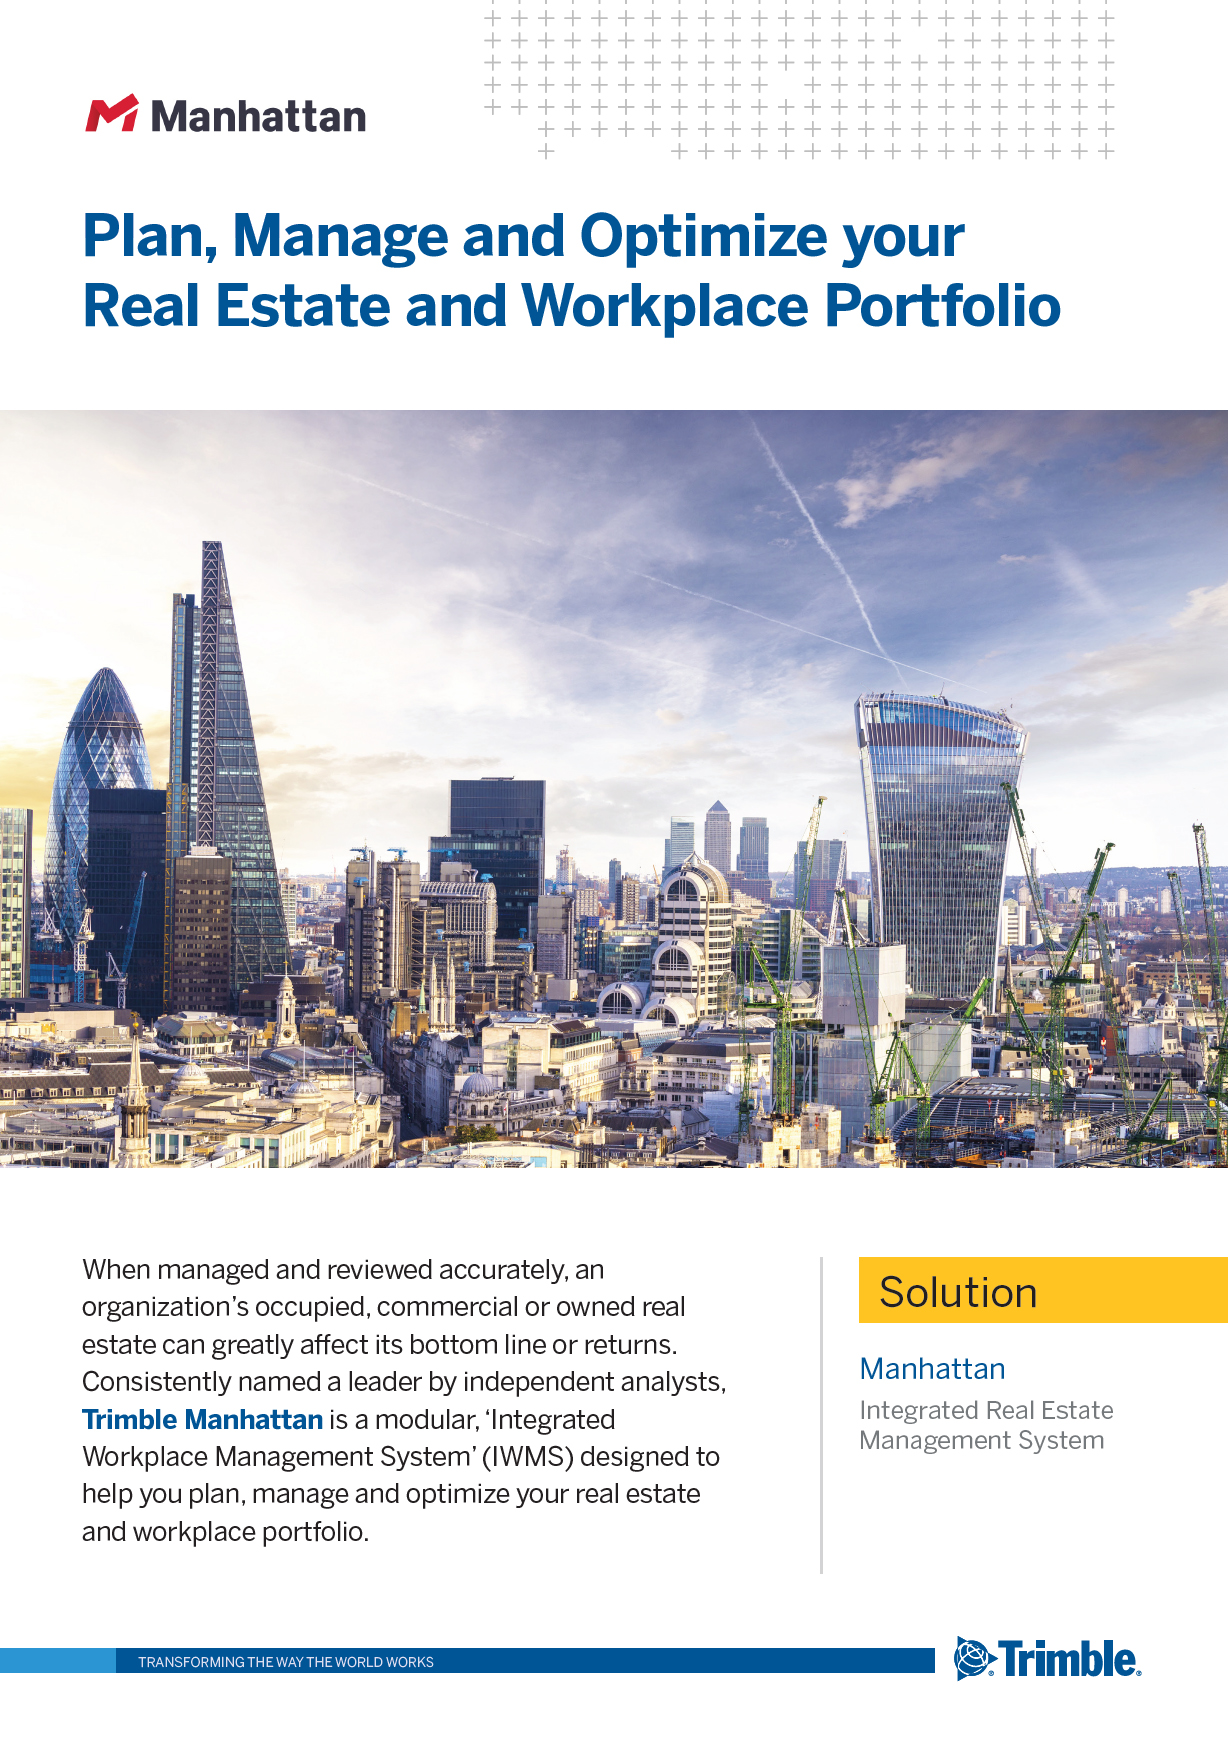 Manhattan – Integrated Real Estate Management Software